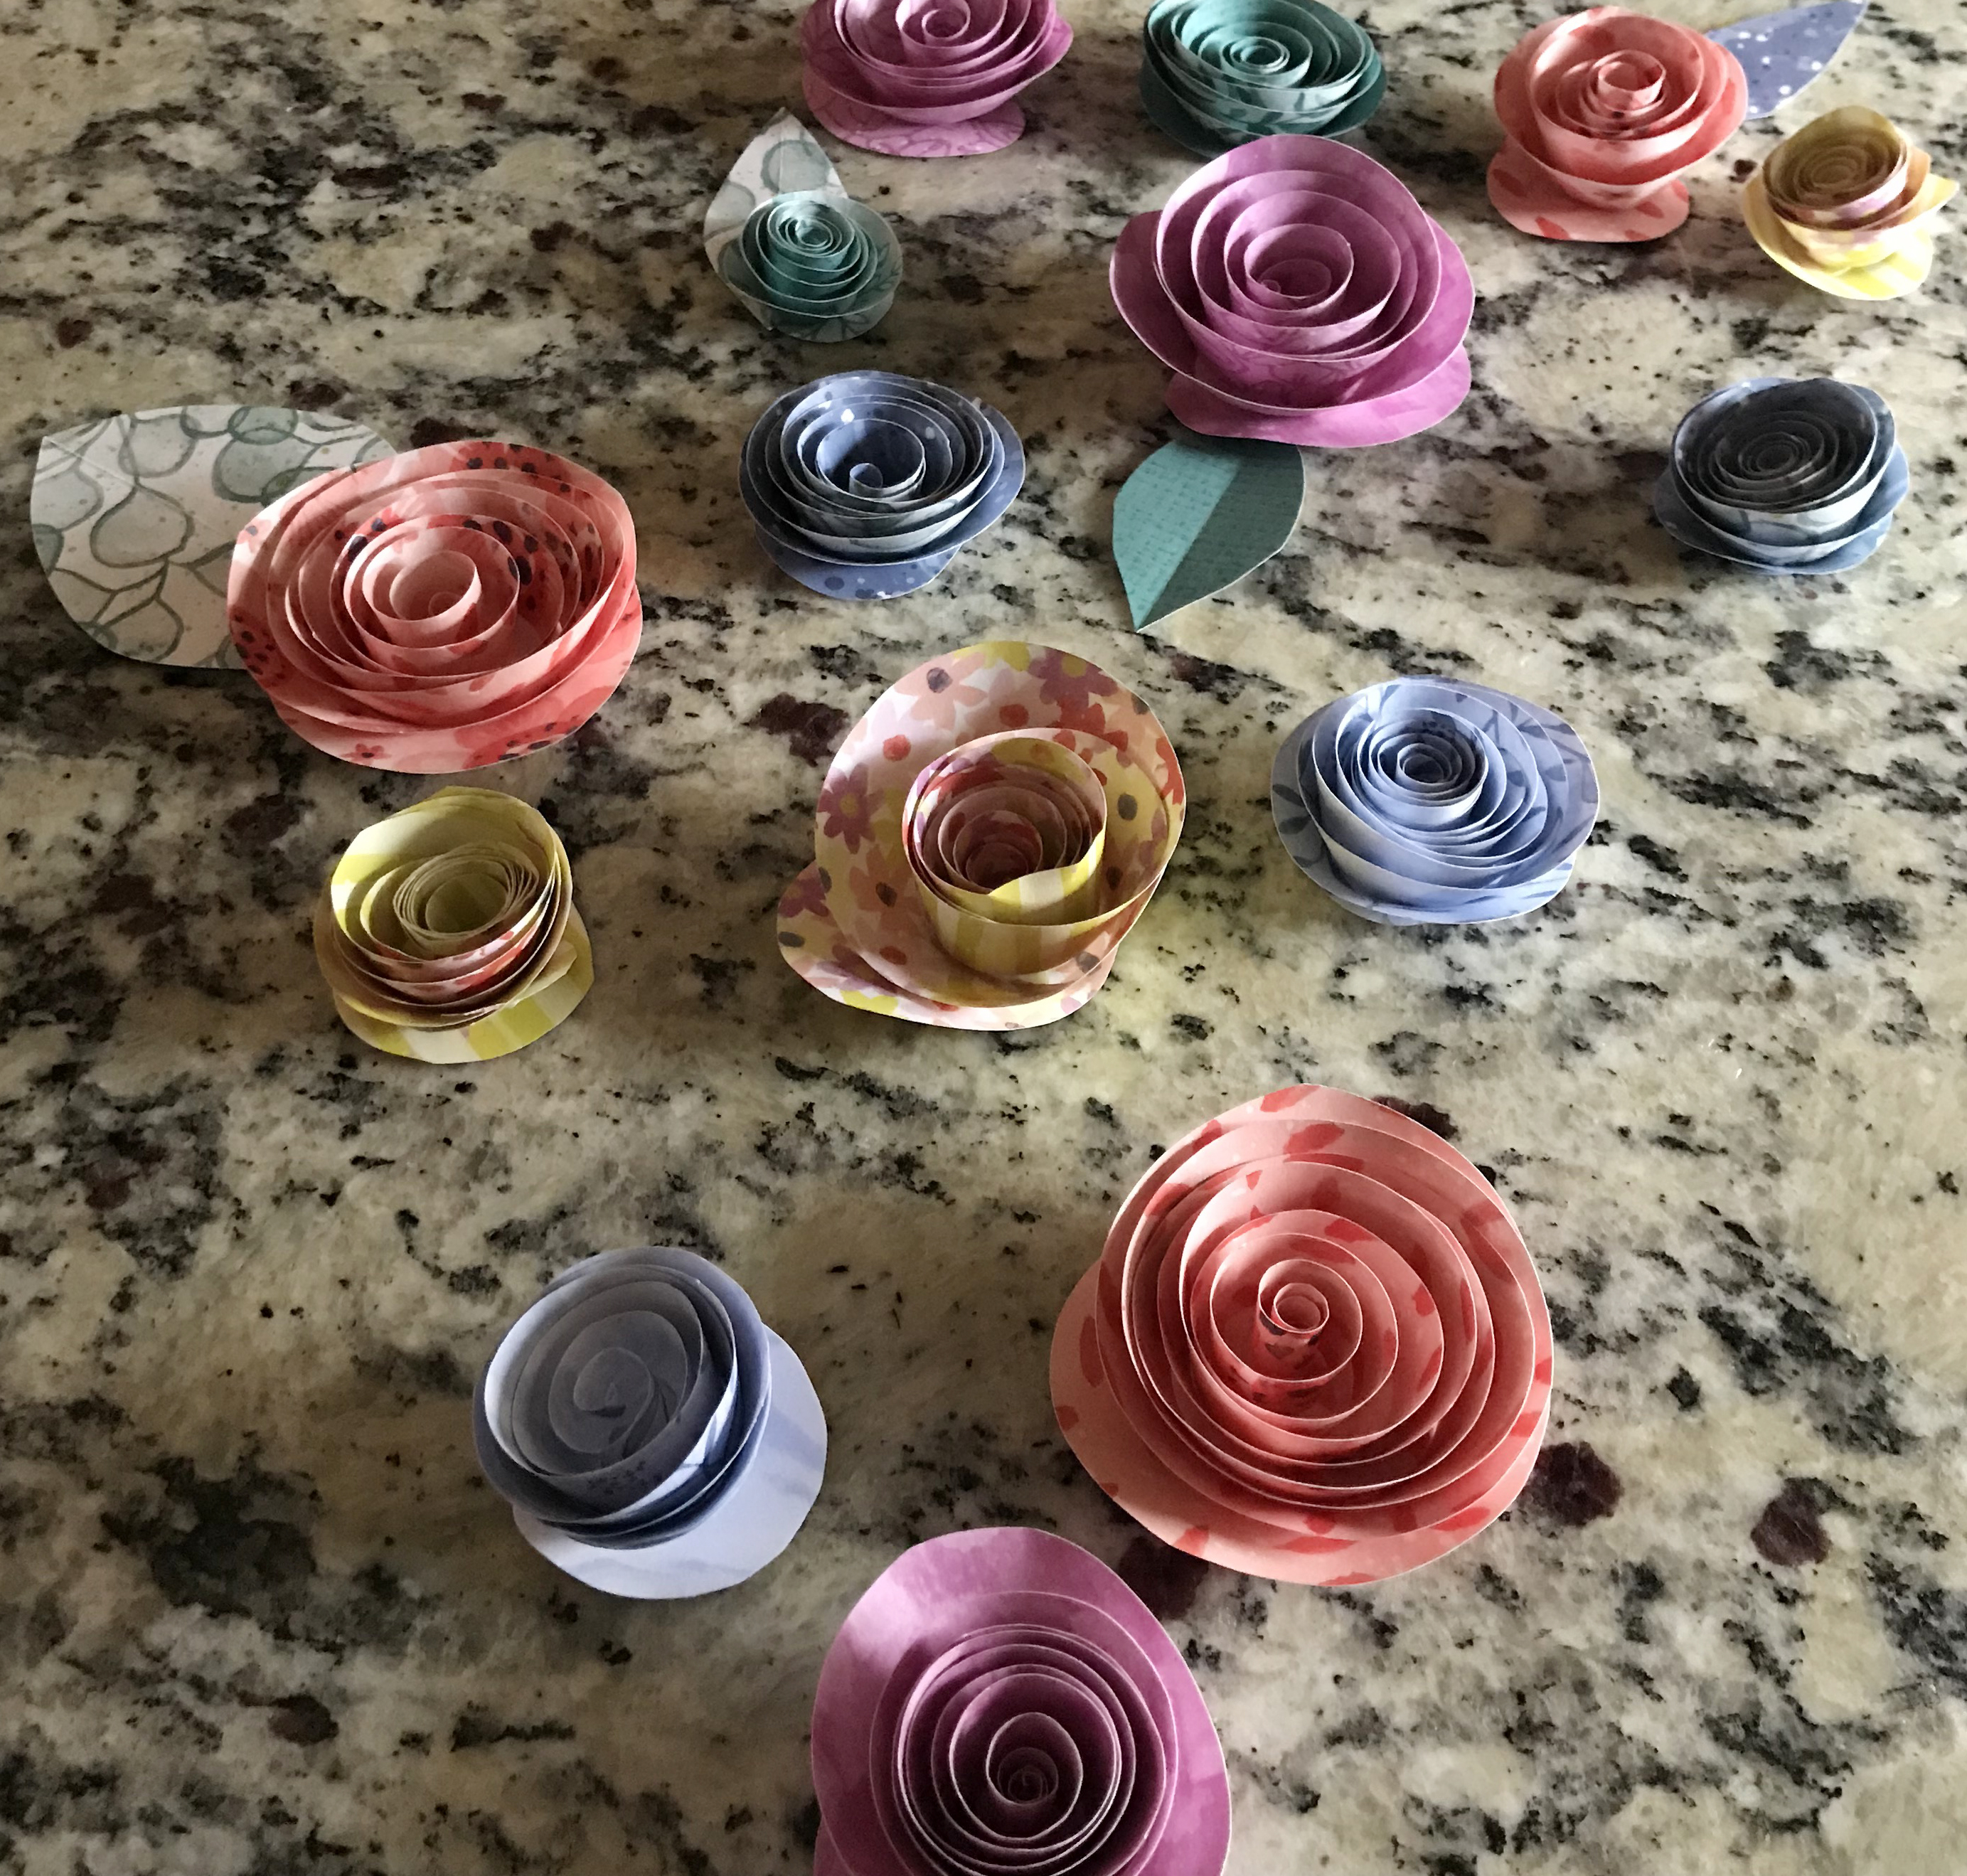 DIY-Paper-Flowers-Full-Bloom-Creative-Memories12